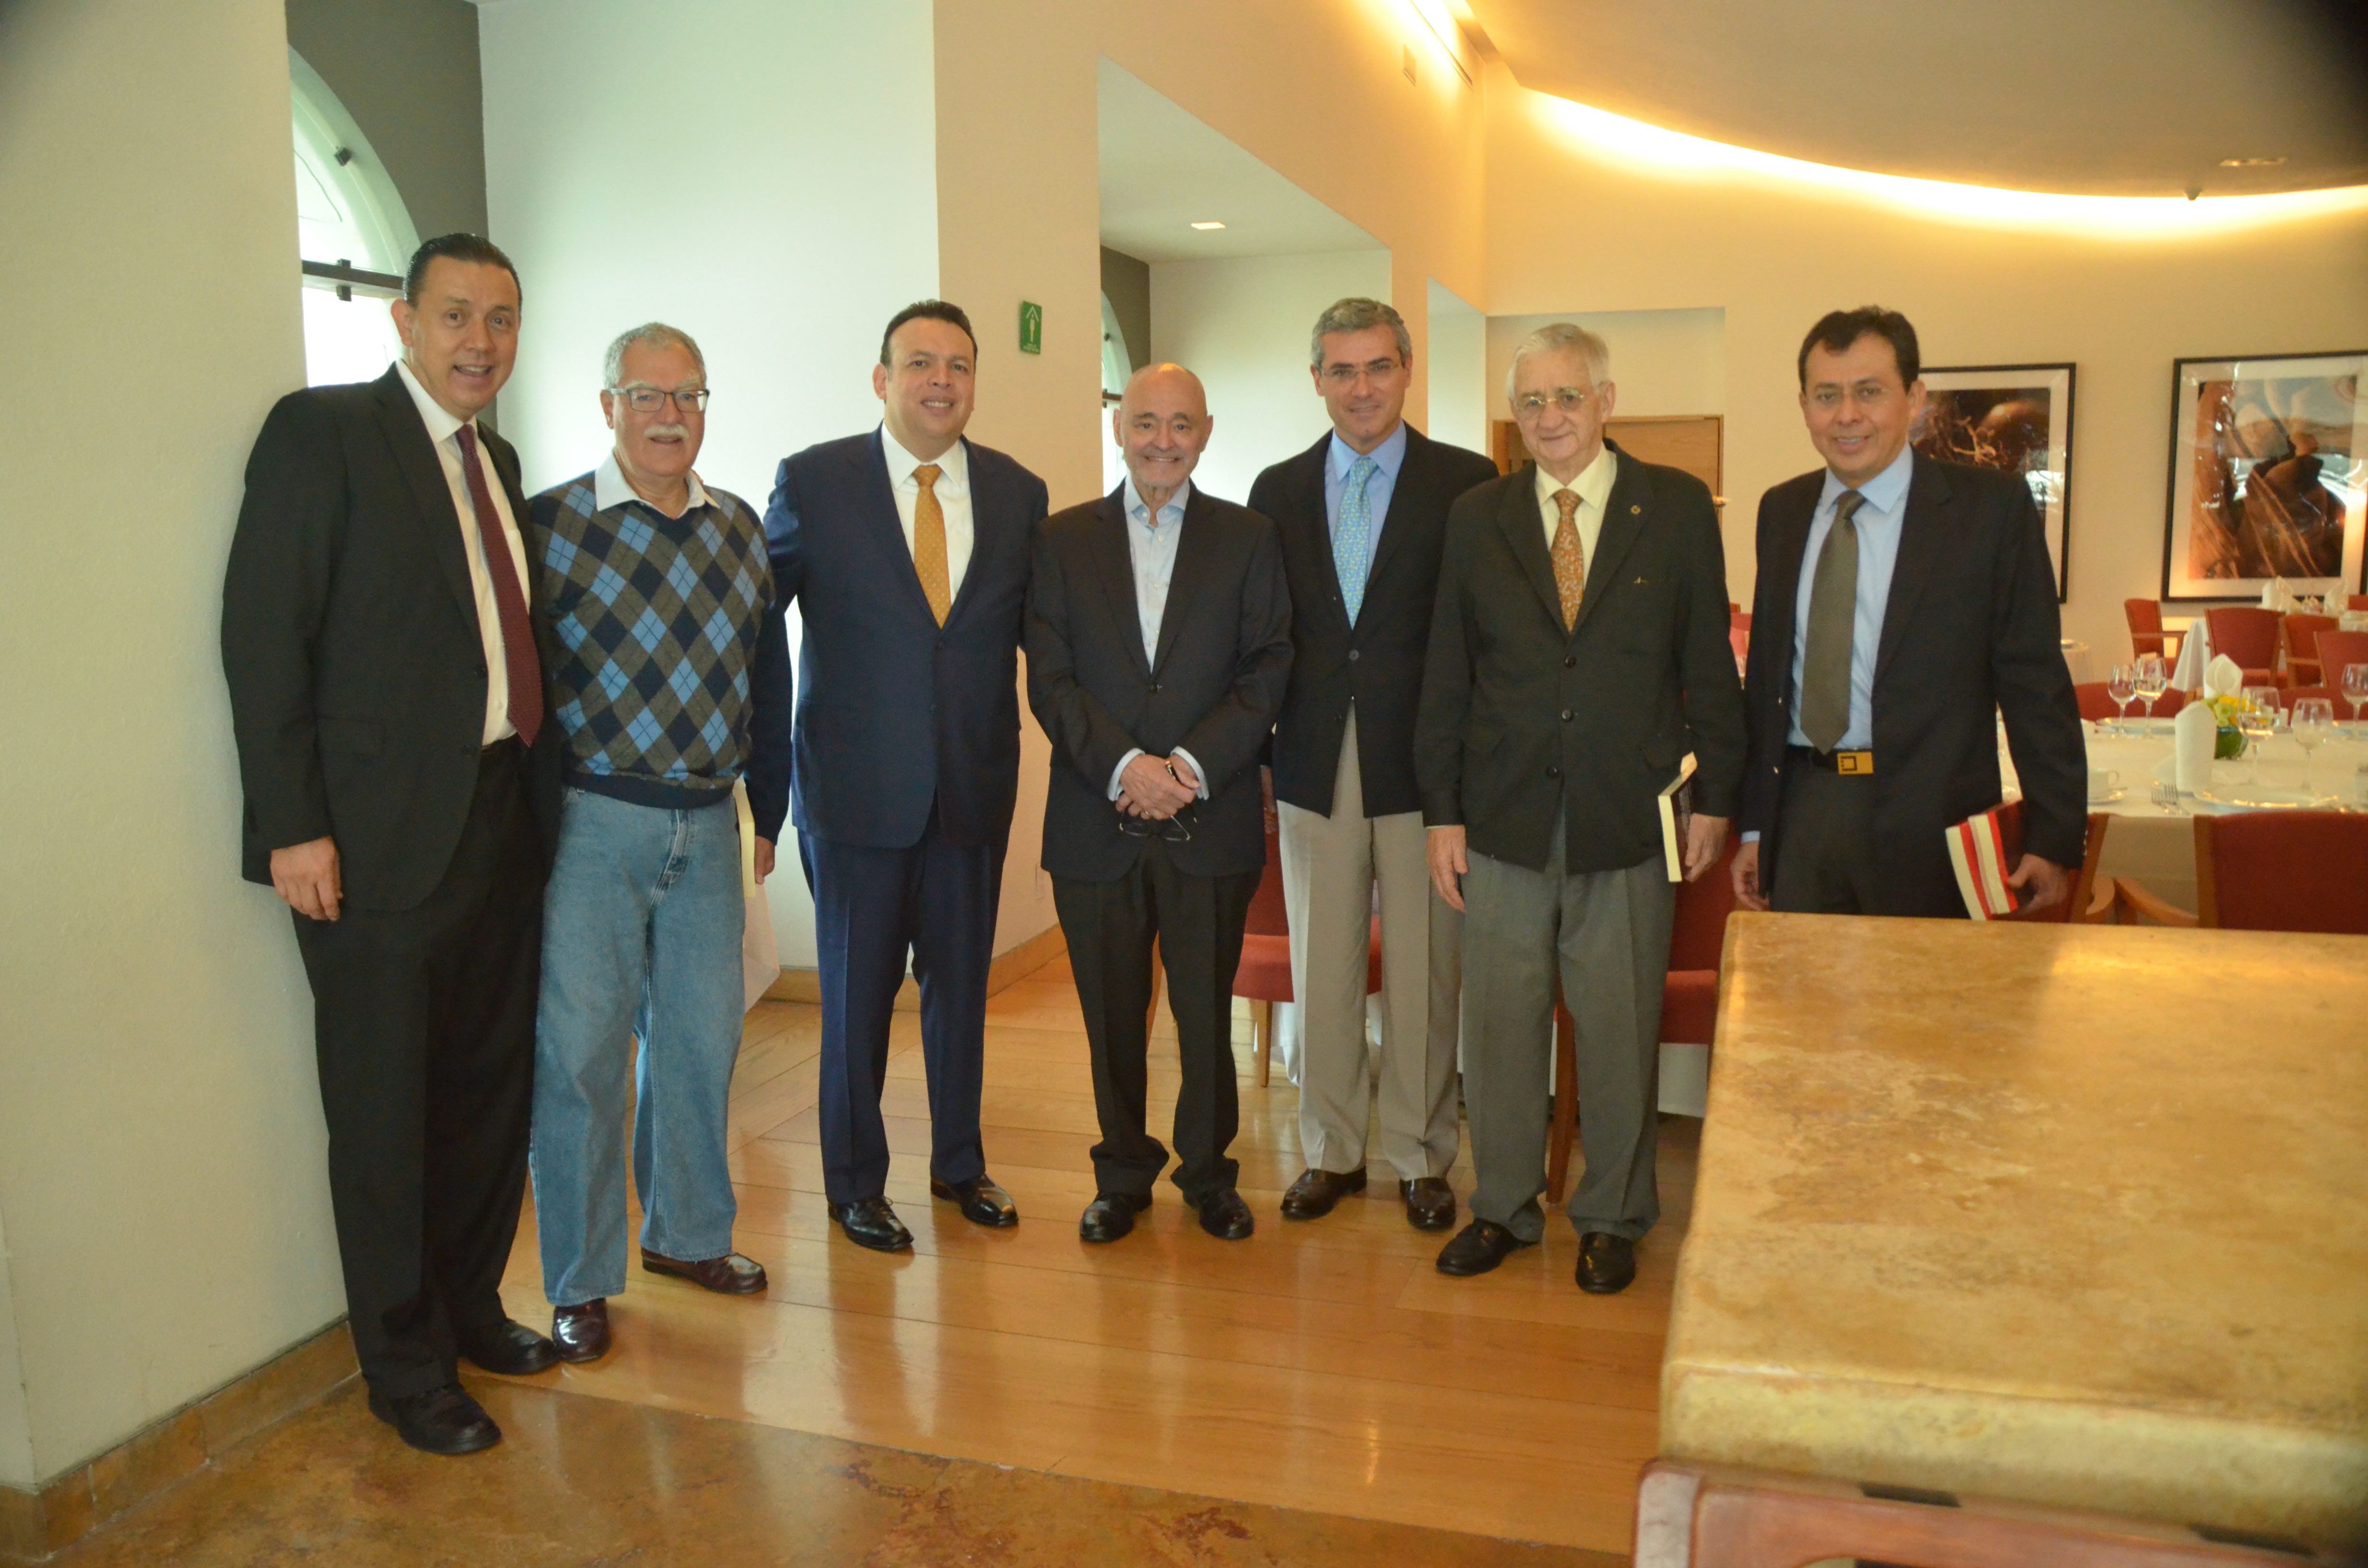 Entrega de libro homenaje al Dr. Jorge Alfredo Domínguez Martínez